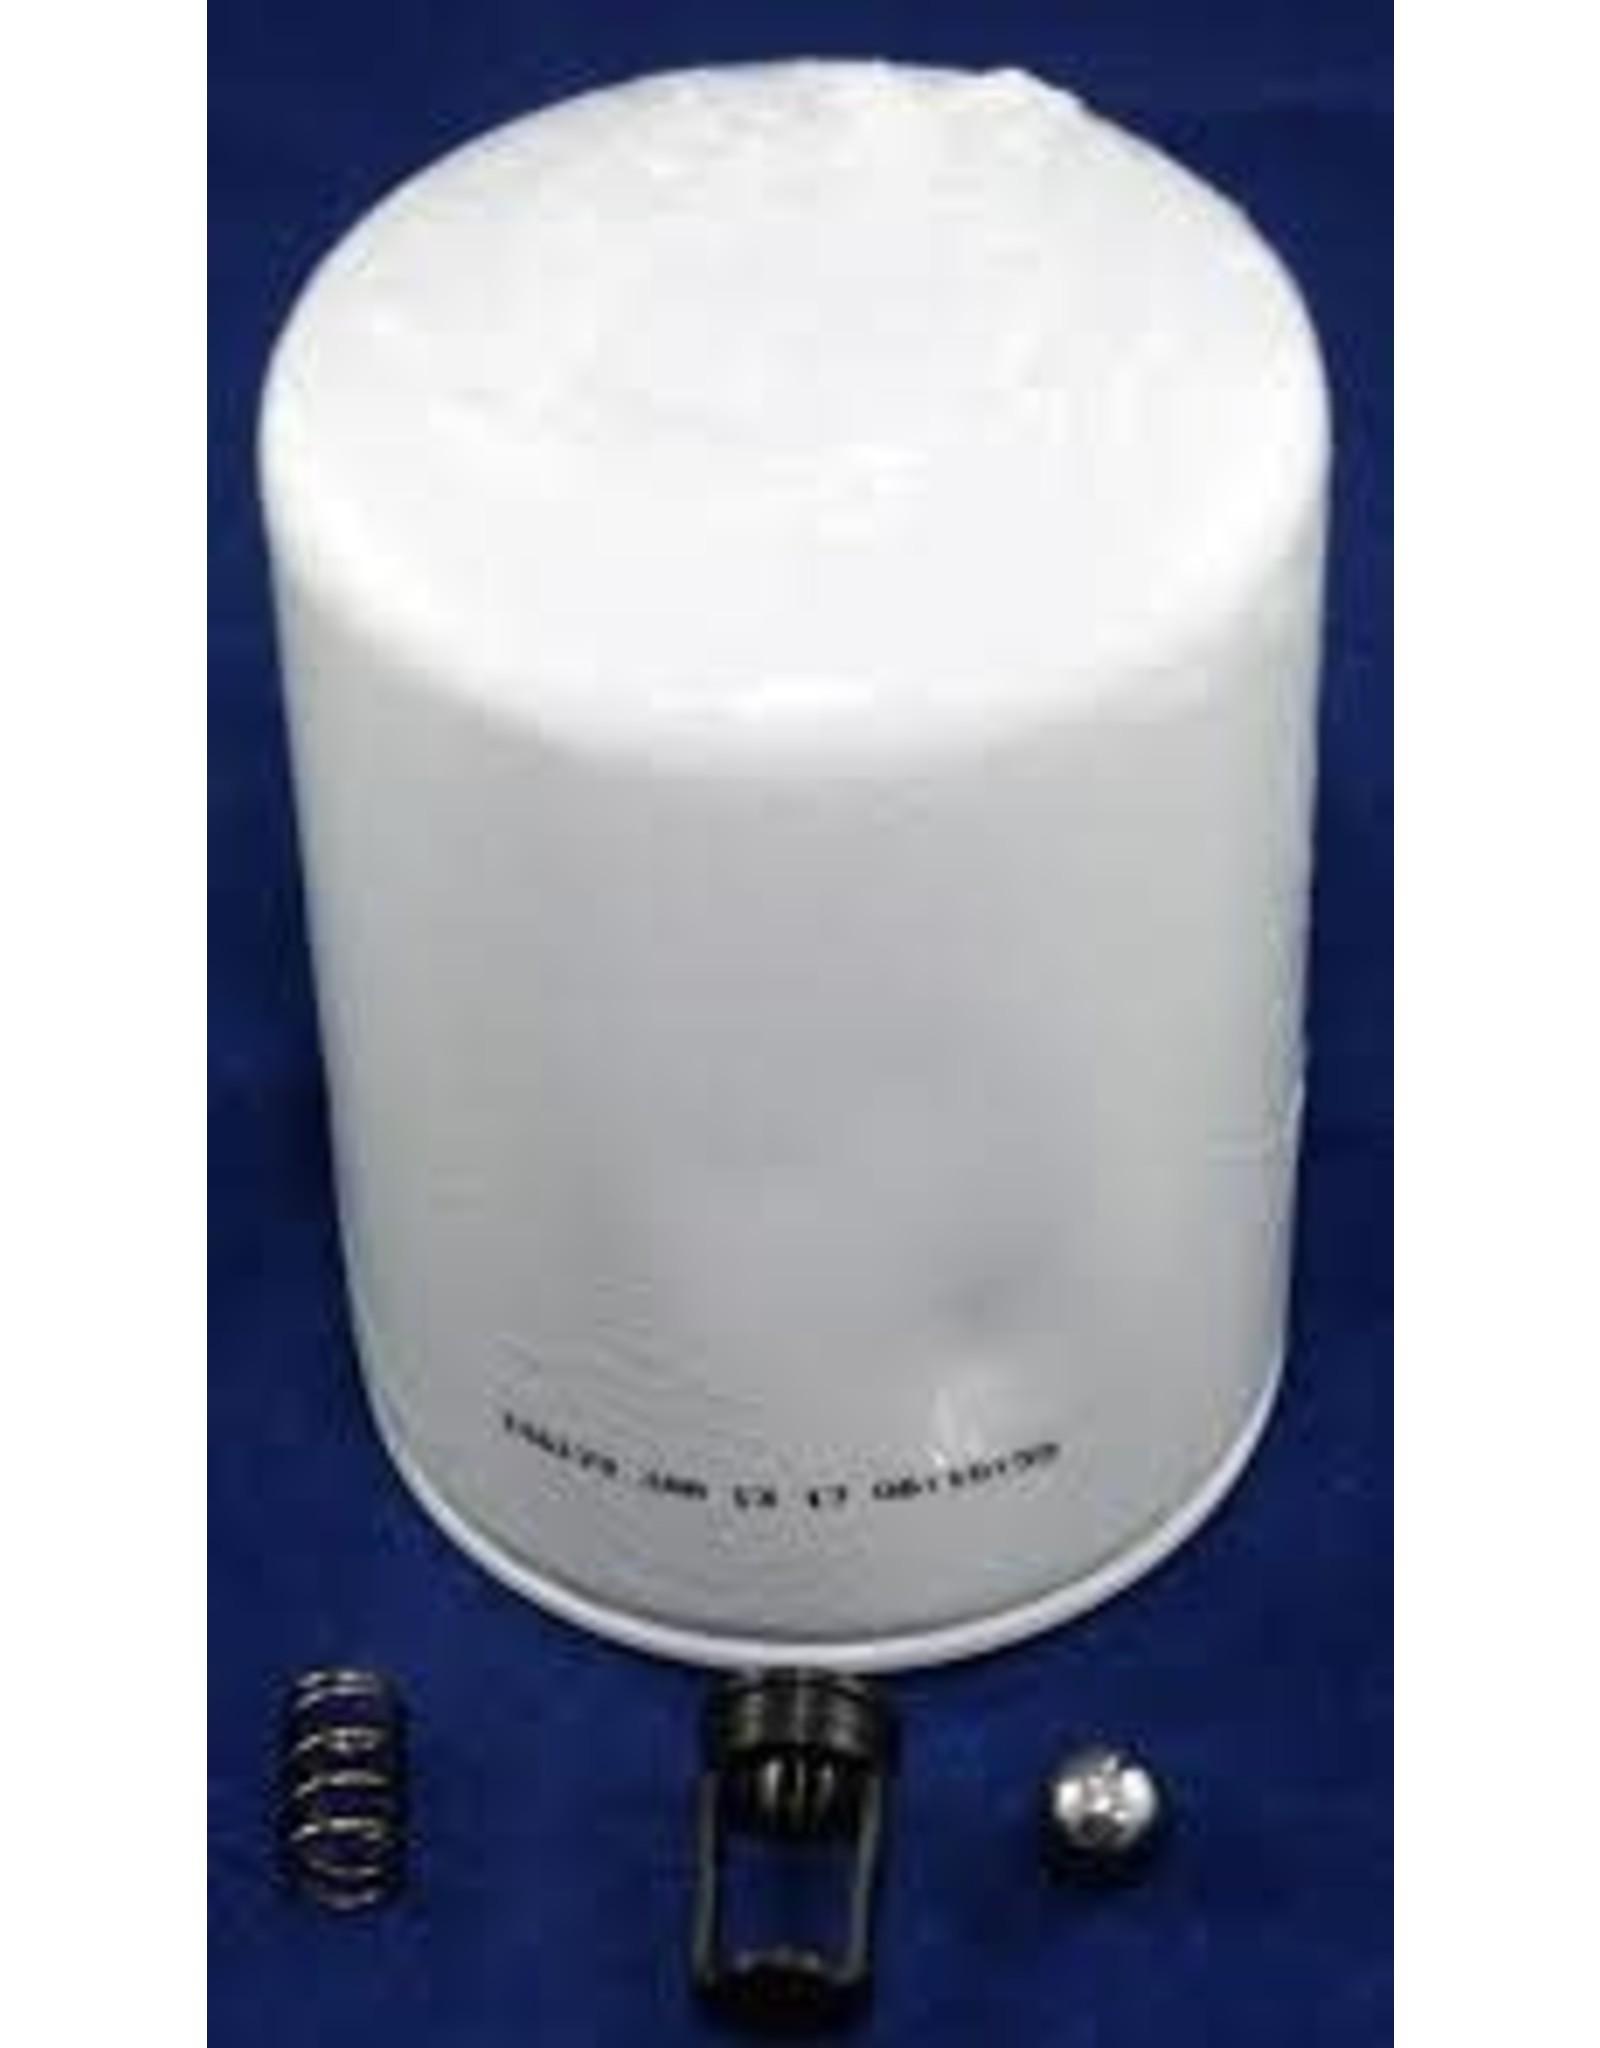 Graco 246173 Graco Hyd. oil Filter